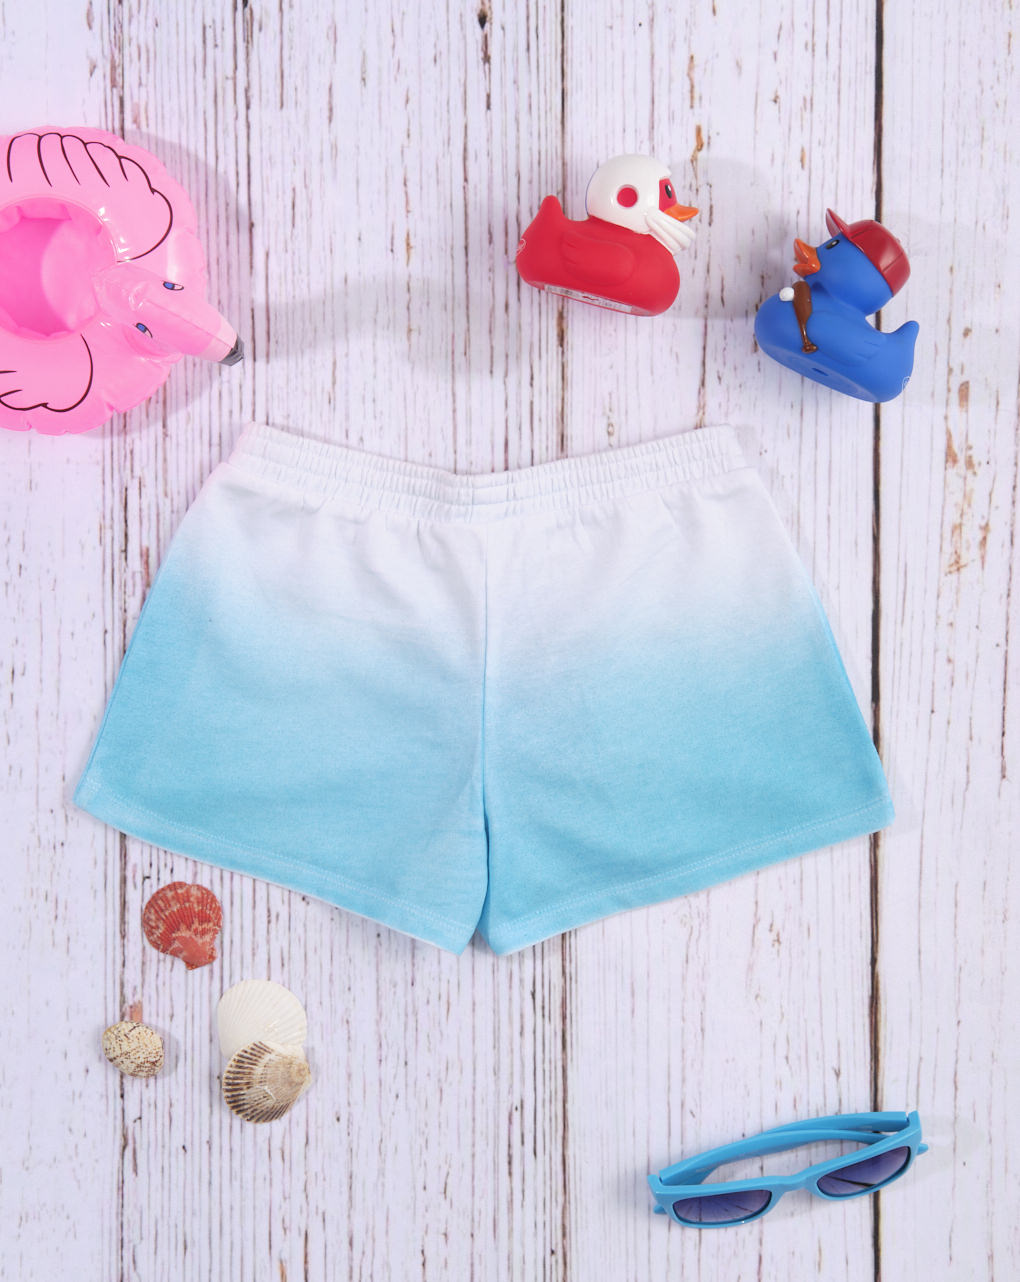 Shorts de jersey branco / azul claro com efeito gradiente - Prénatal